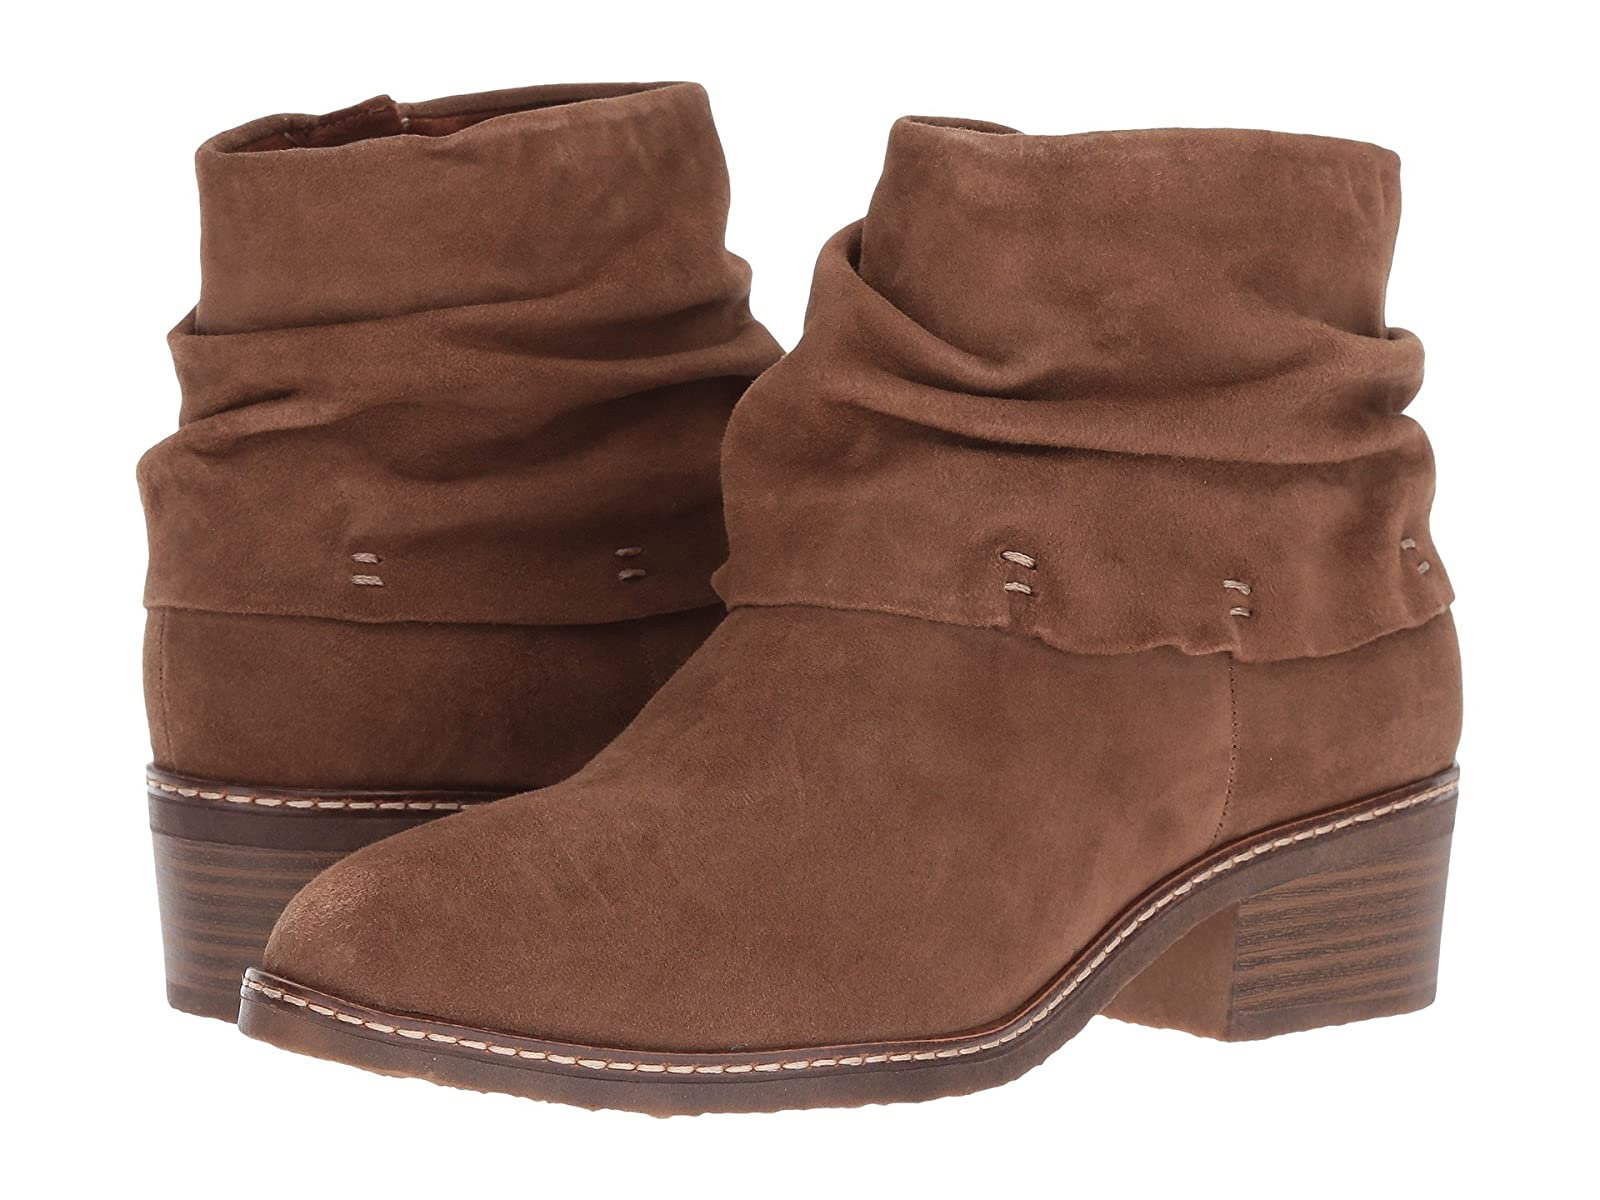 Tamaris Kathryn 1-1-25033-29Cheap and distinctive eye-catching shoes